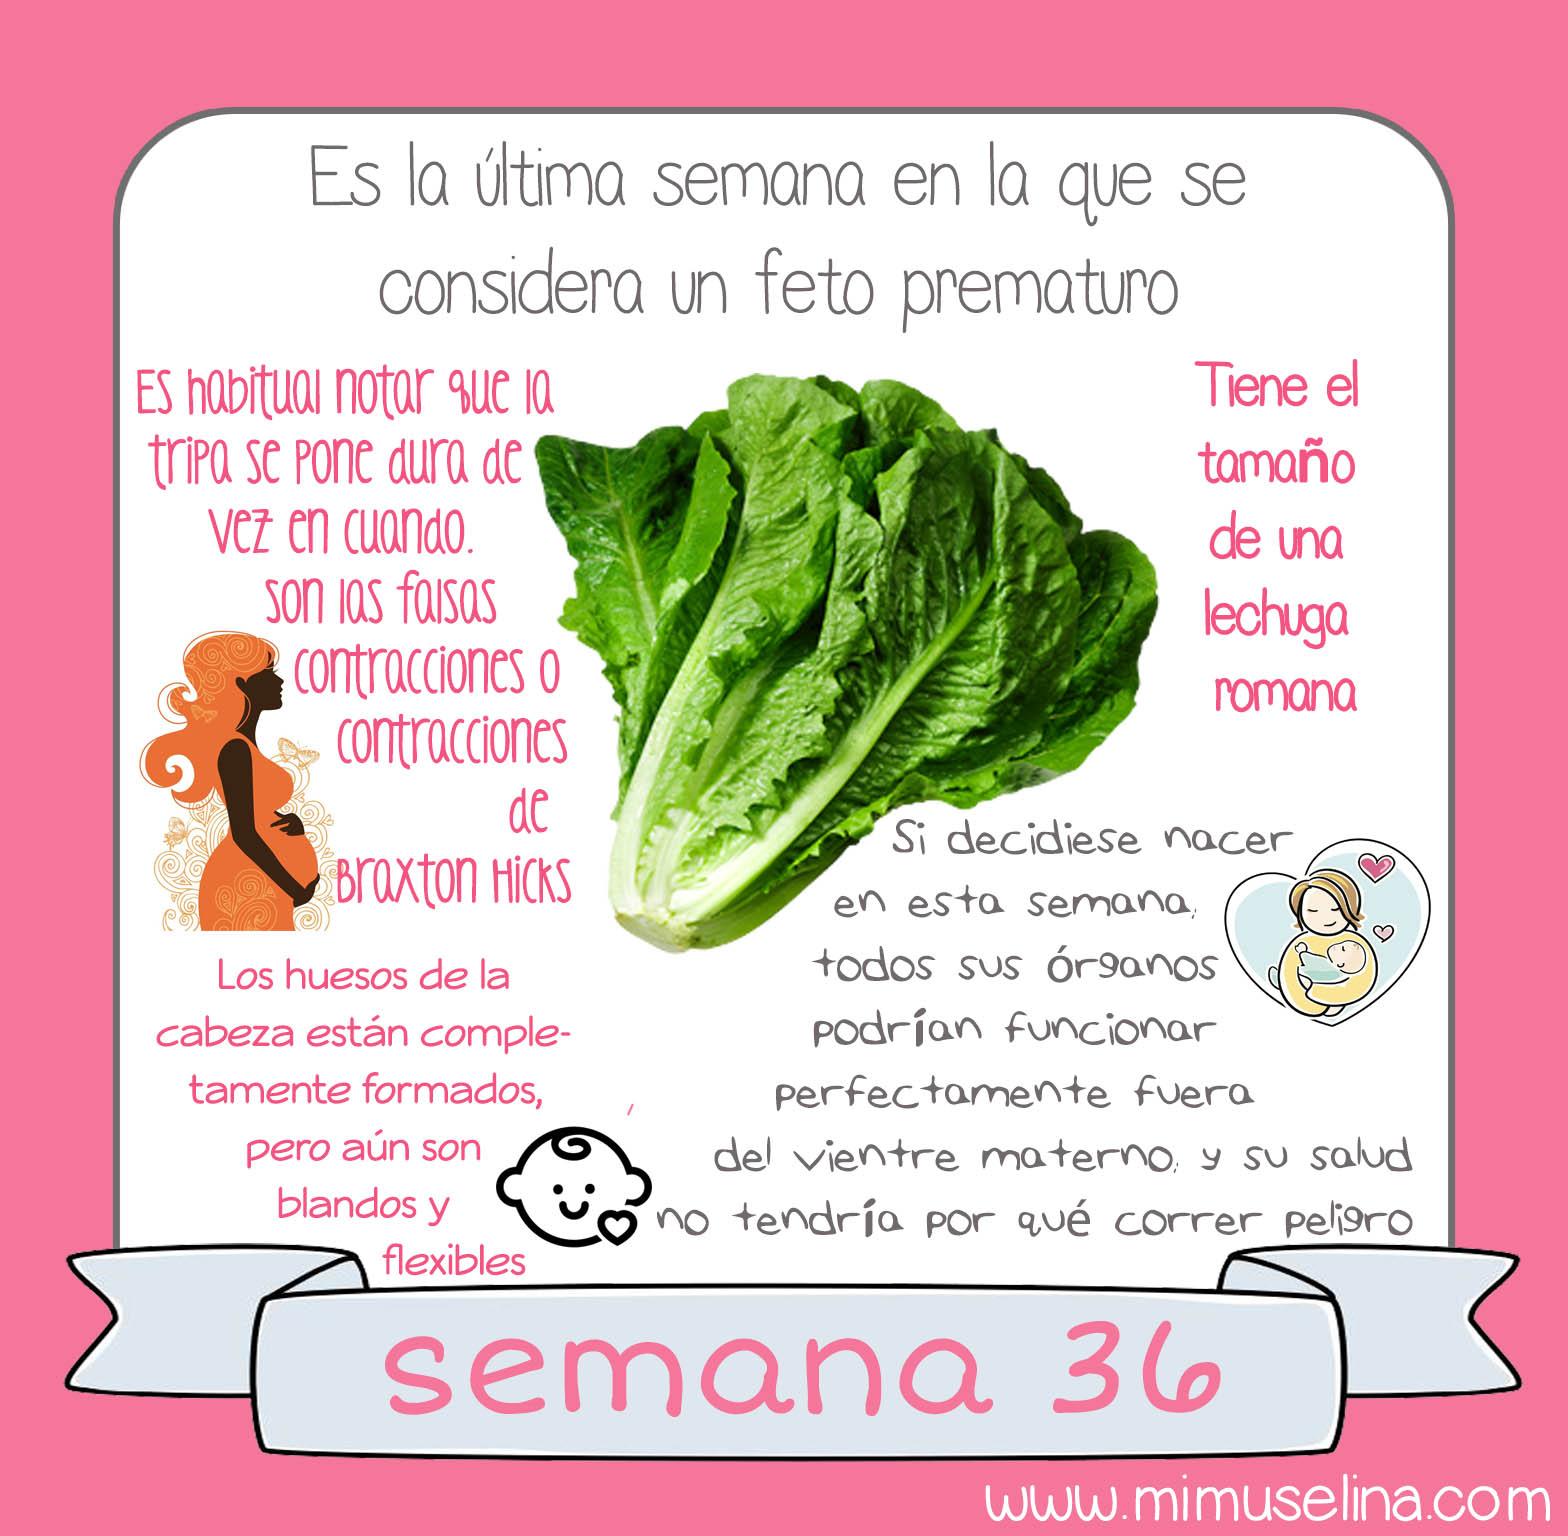 Bebeblog By Mimuselina Semana 36 Embarazo Tamaño Y Evolución Del Bebé Mimuselina Embarazo 36 Semanas De Embarazo Etapas Embarazo